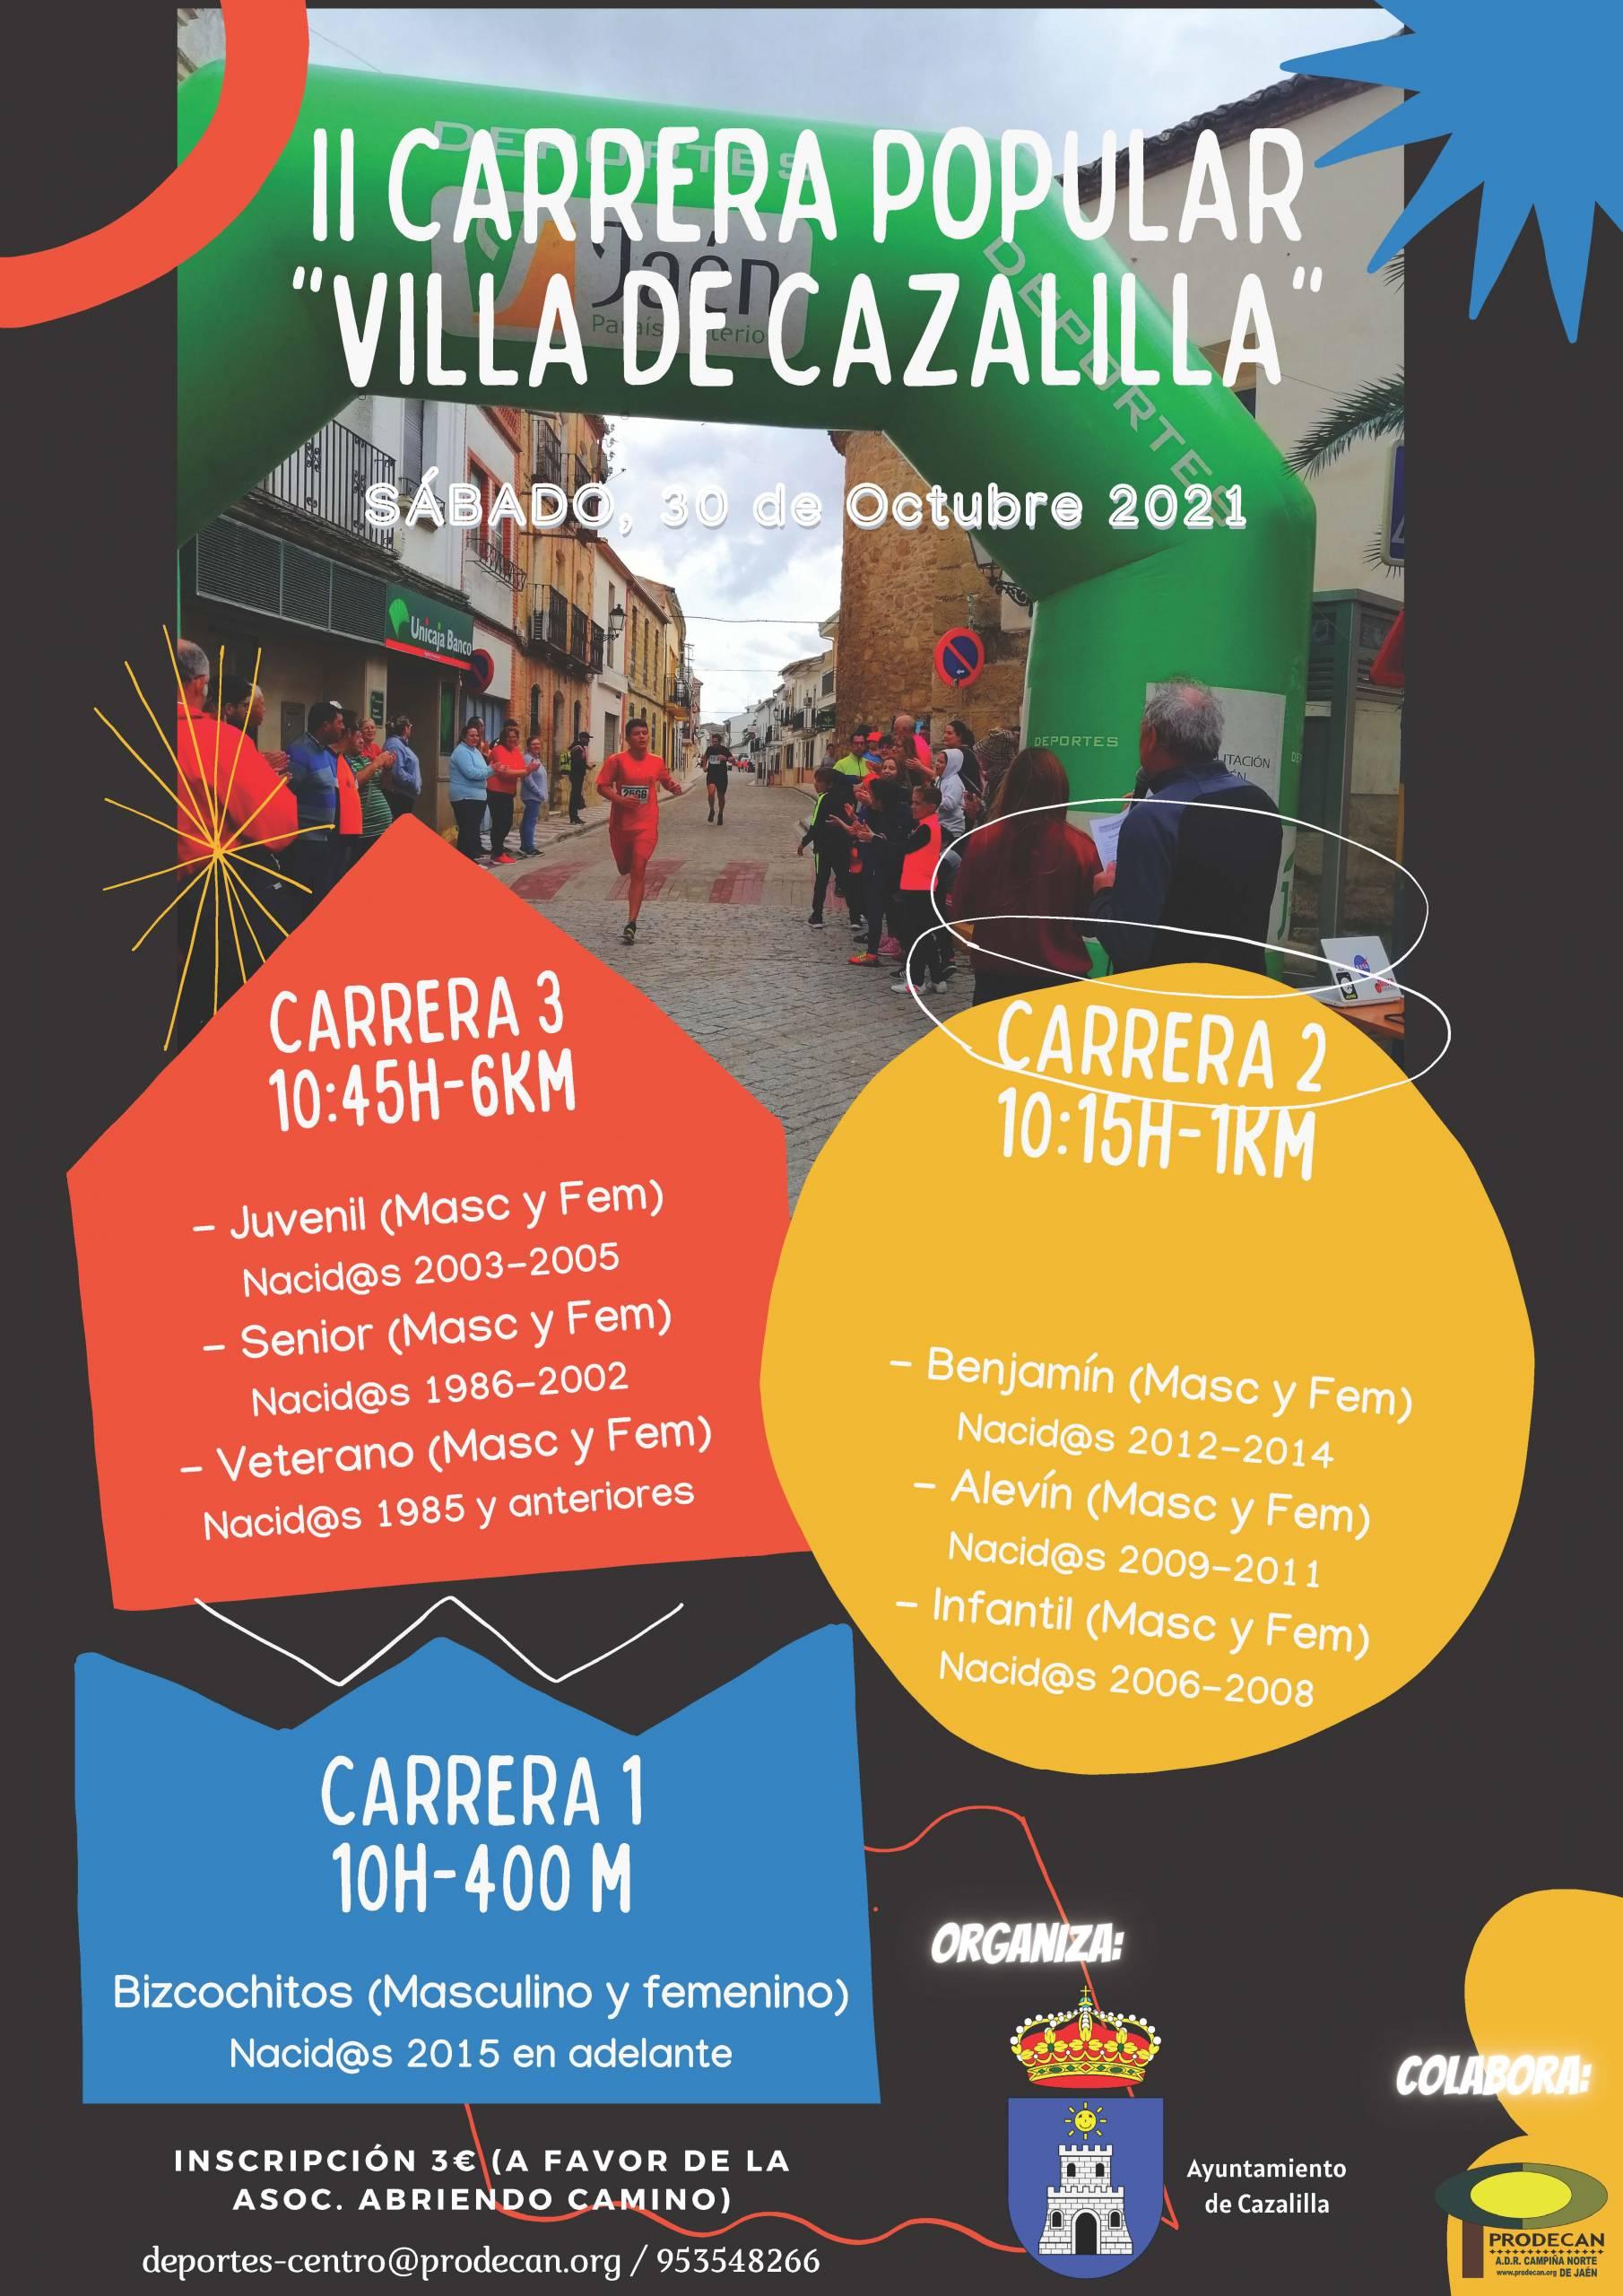 II Carrera Popular Villa de Cazalilla